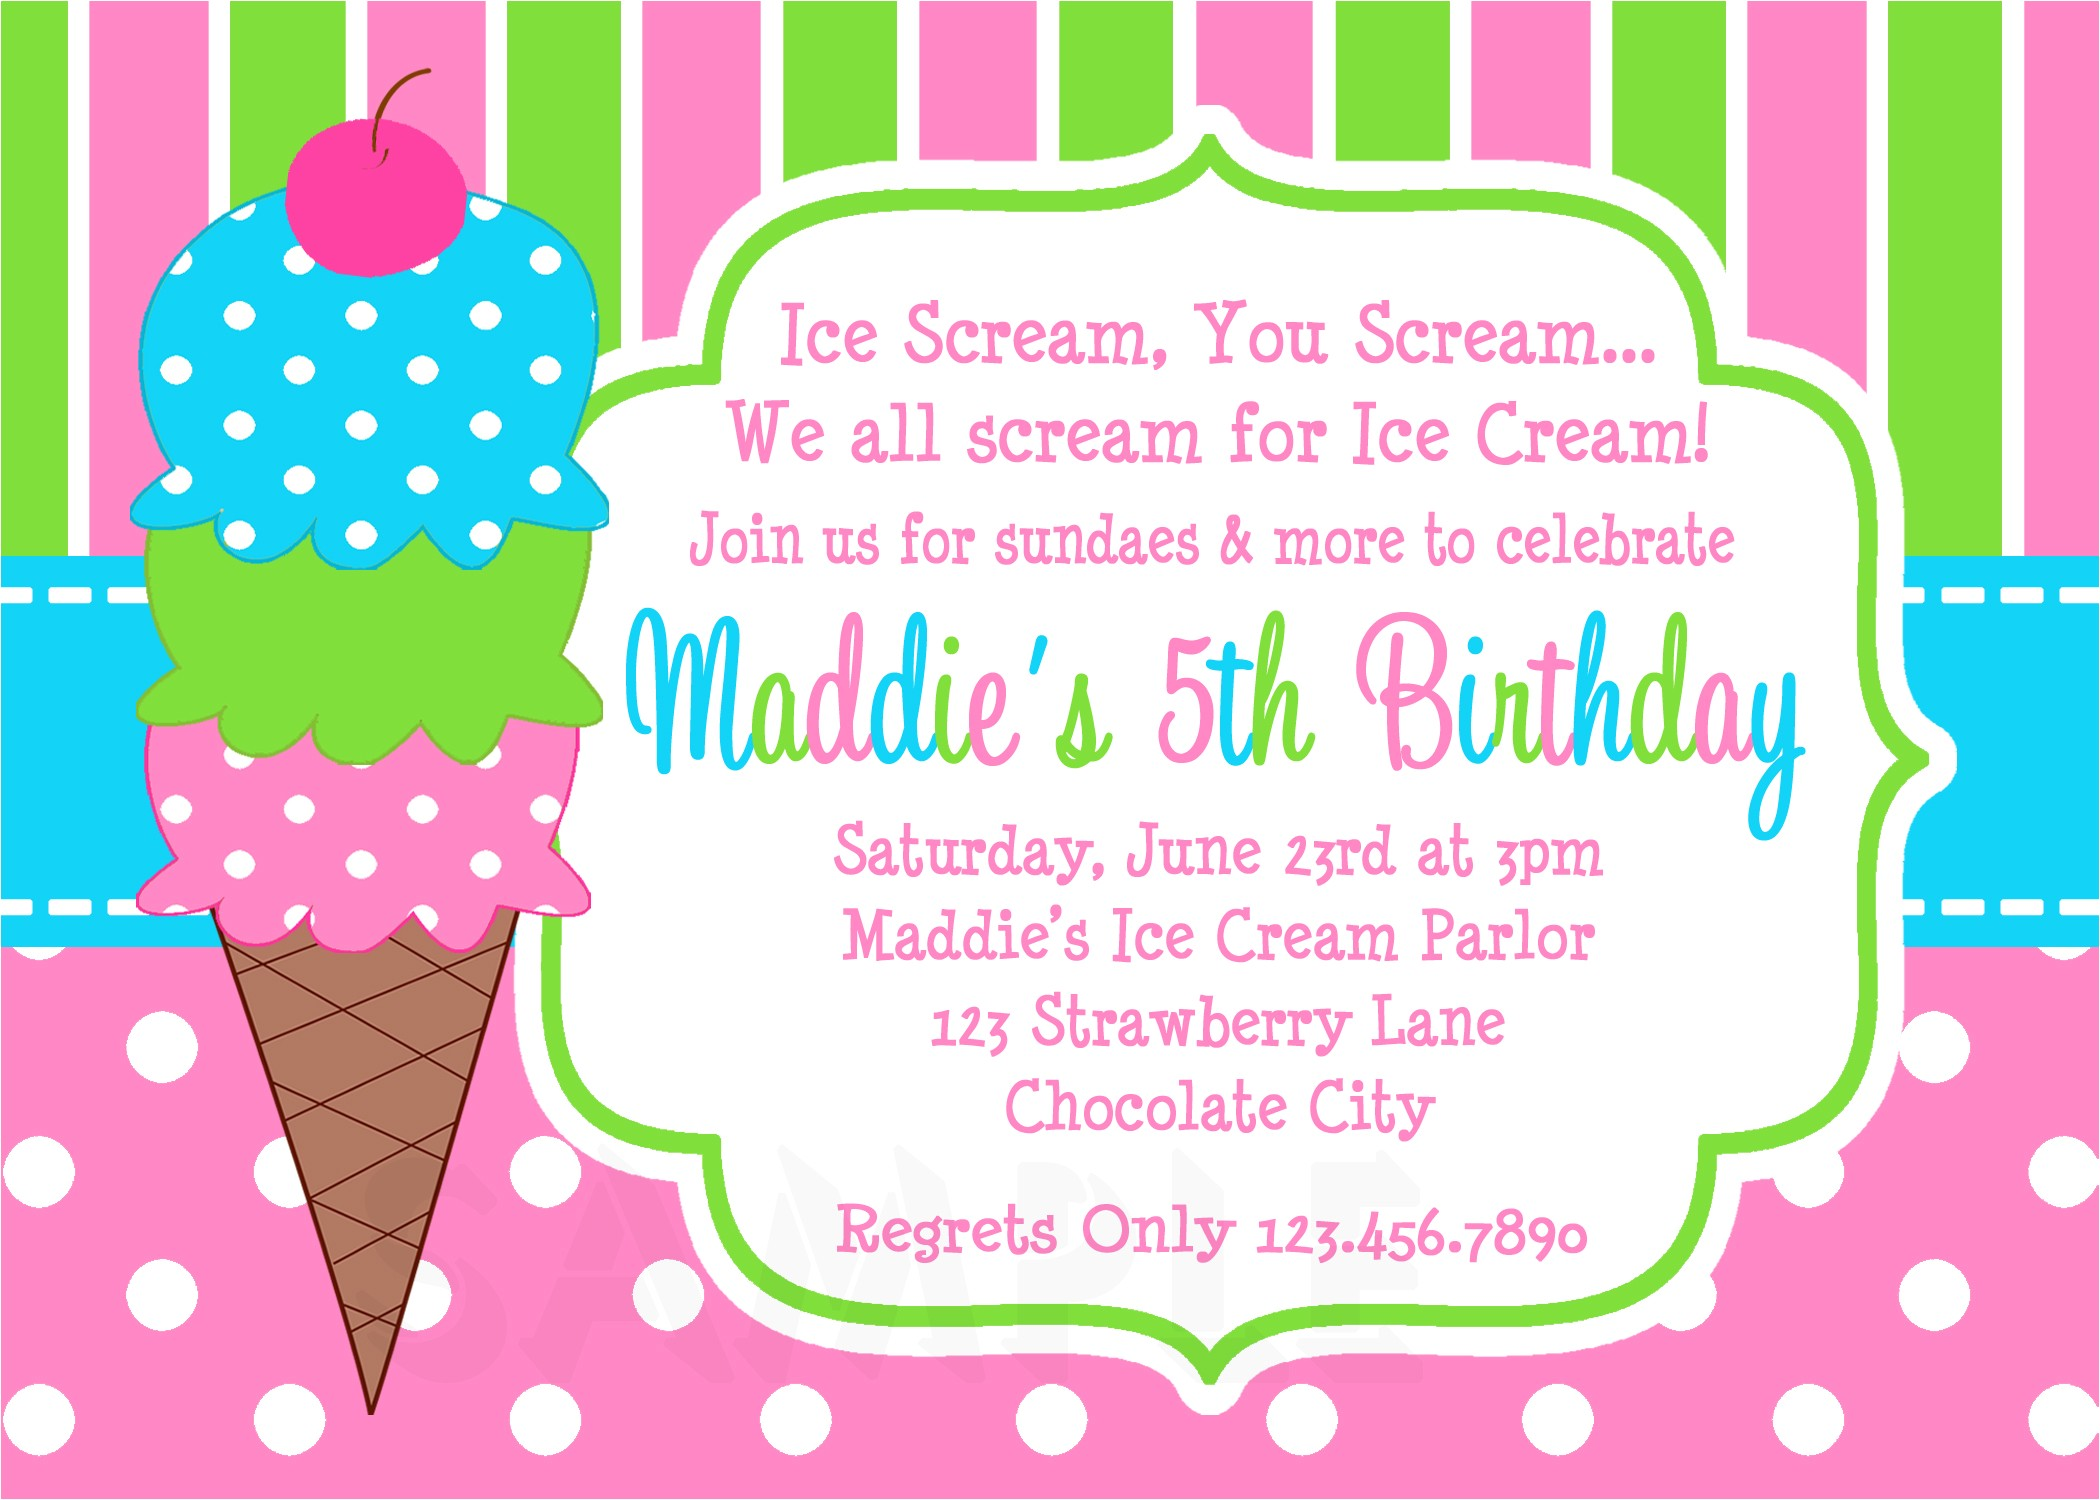 ice cream birthday party invitations pink green